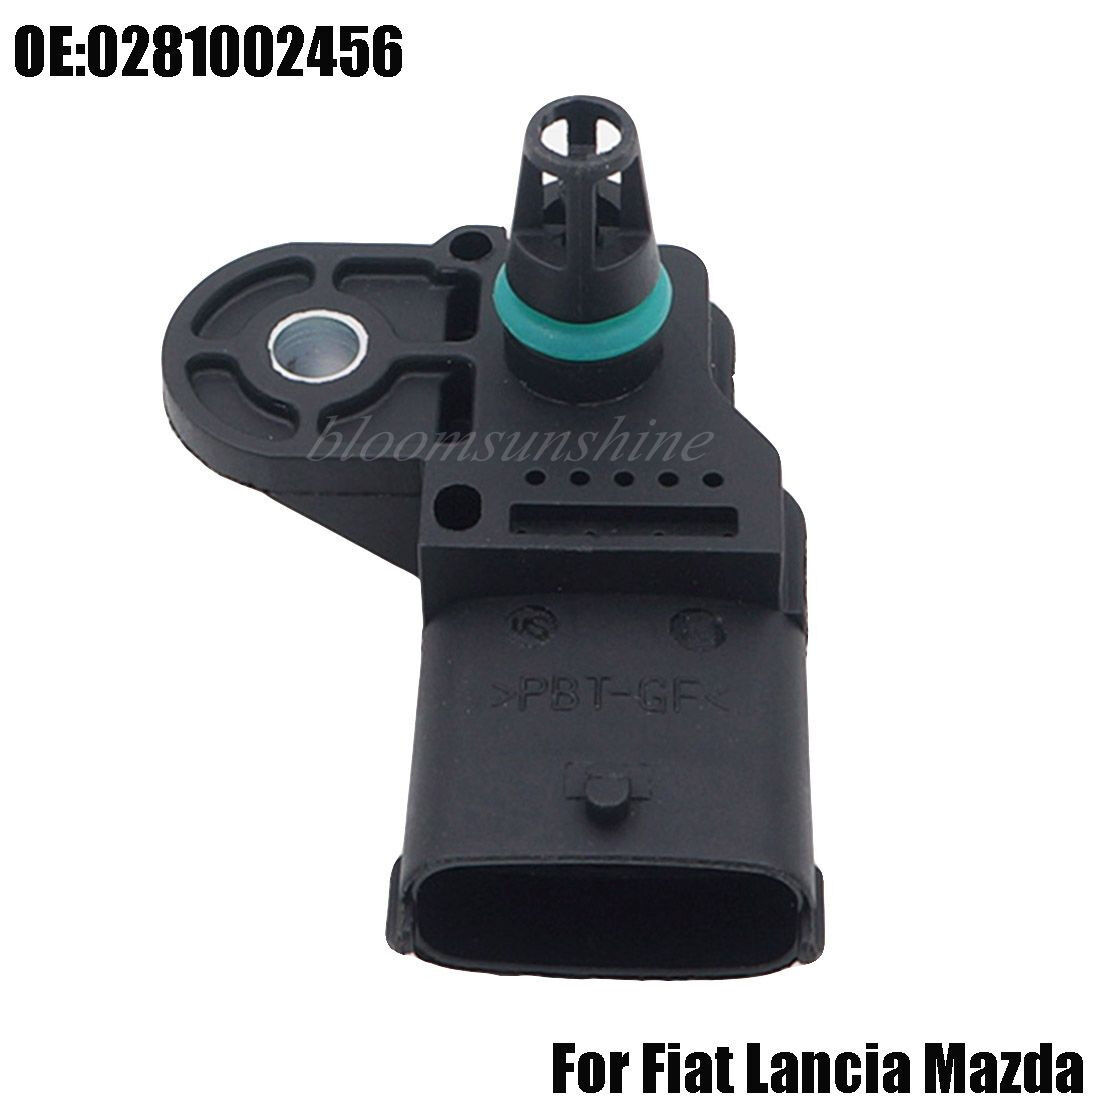 BOSCH Intake Manifold Pressure Sensor MAP Fits ALFA ROMEO FIAT 0.9-1.4L 2000